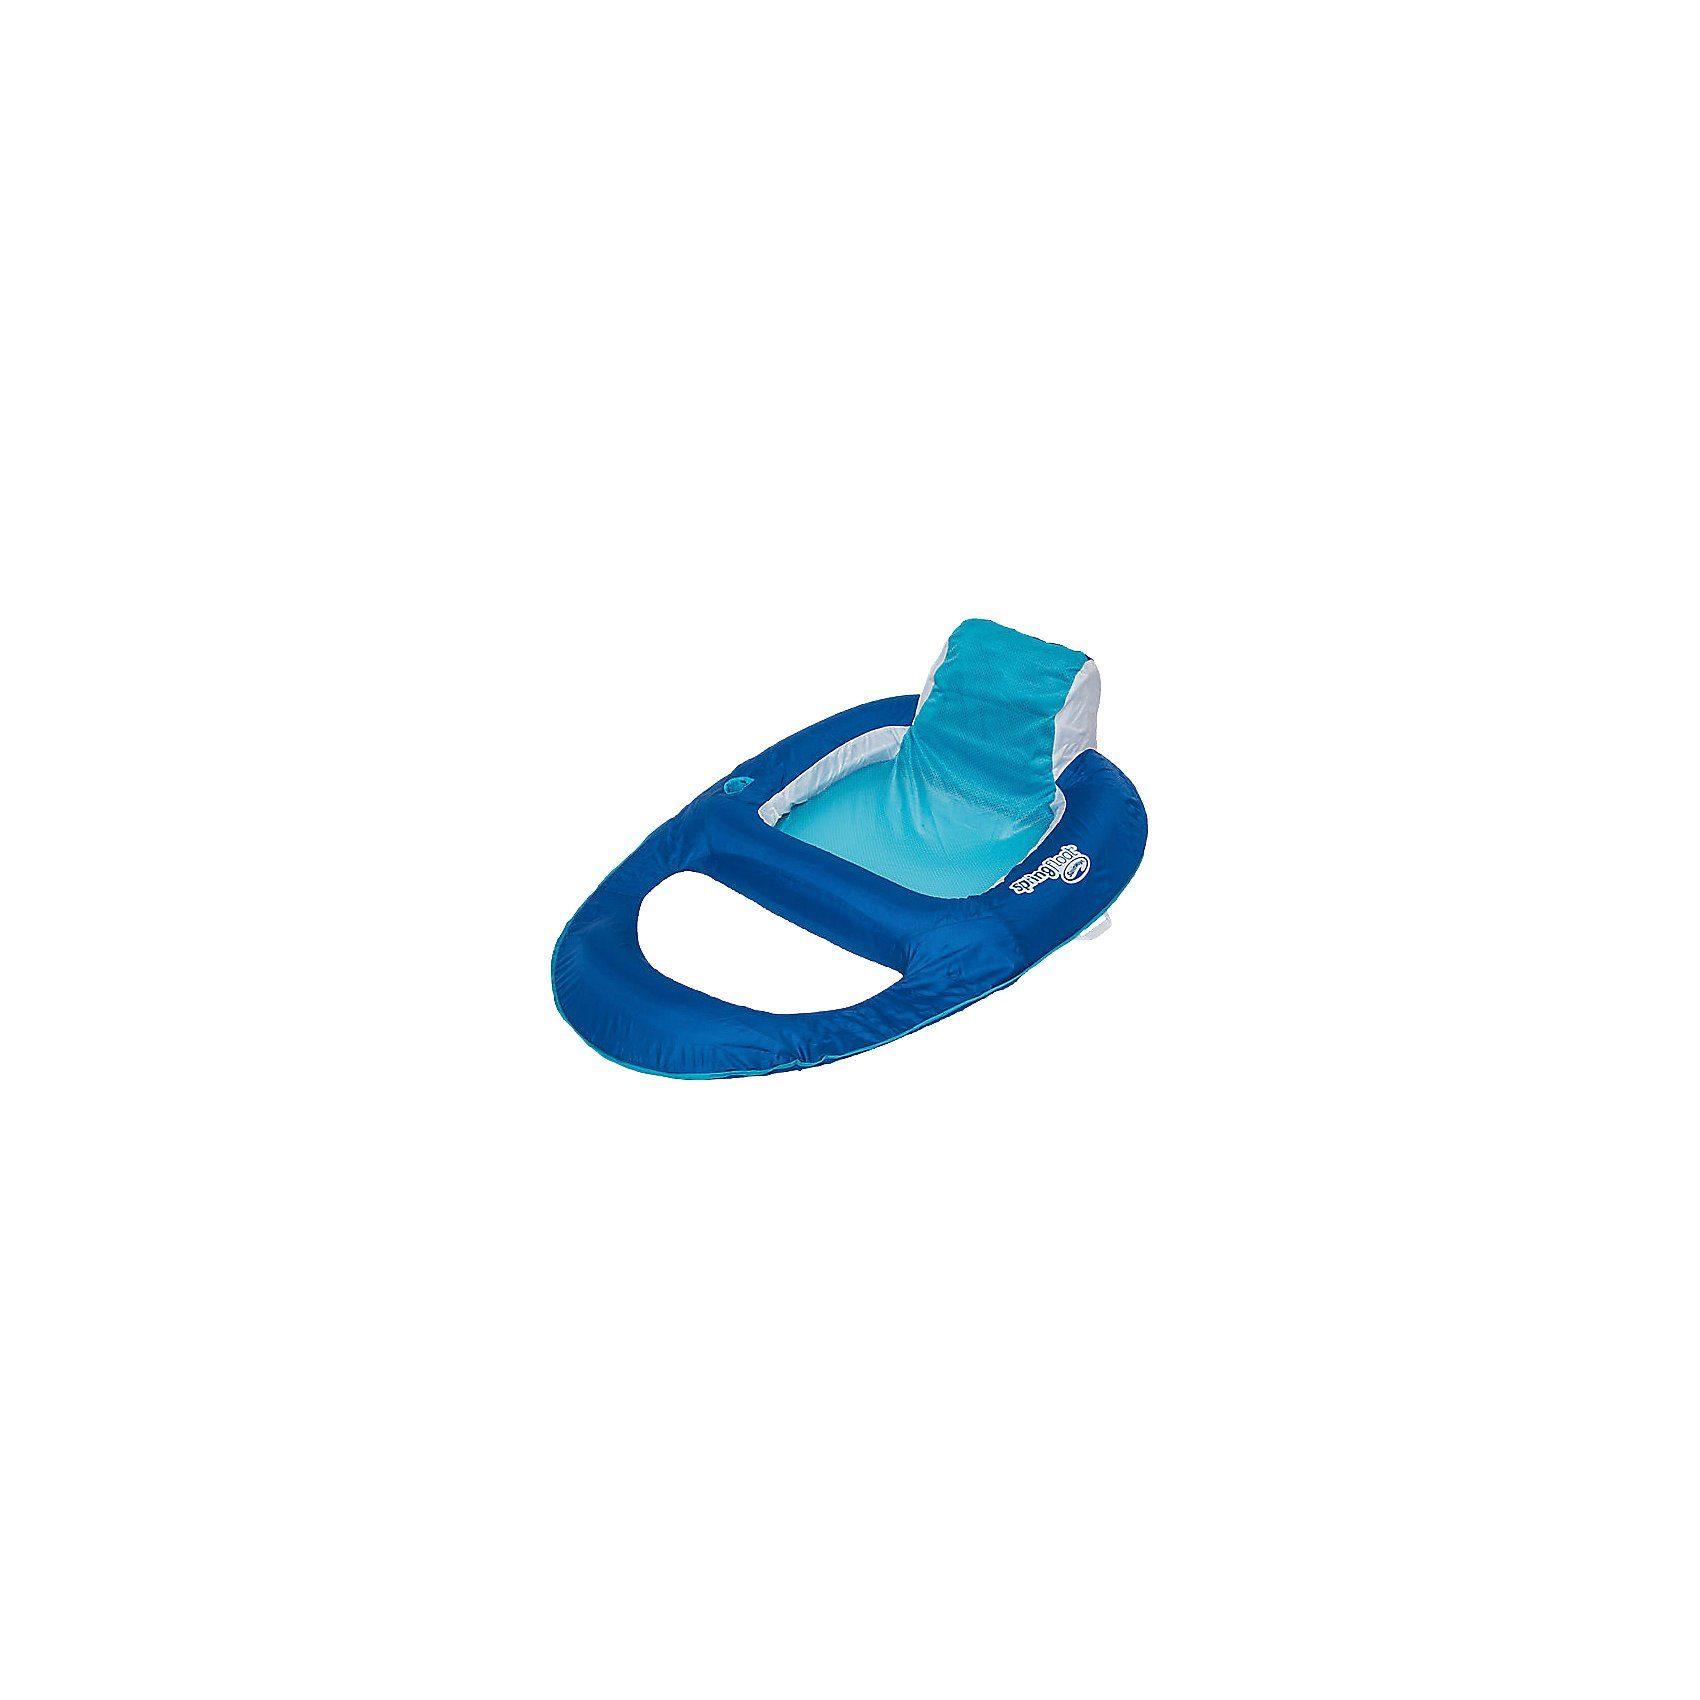 Spin Master Spring Float Recliner Wasserhängematte